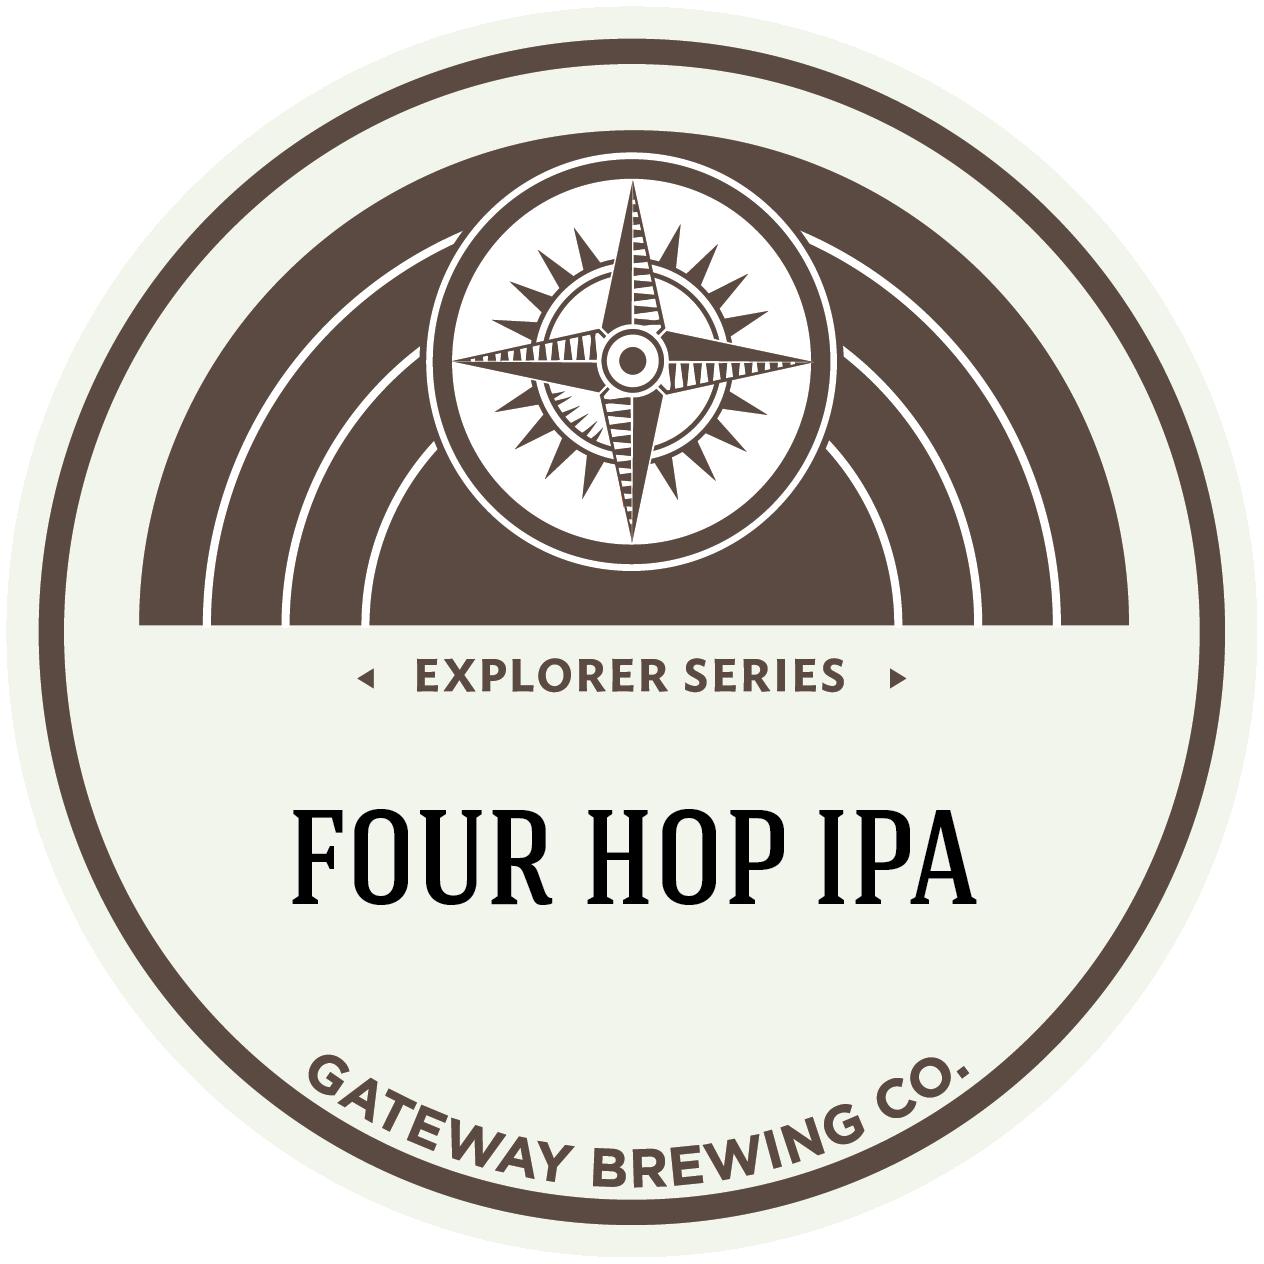 Four Hop IPA